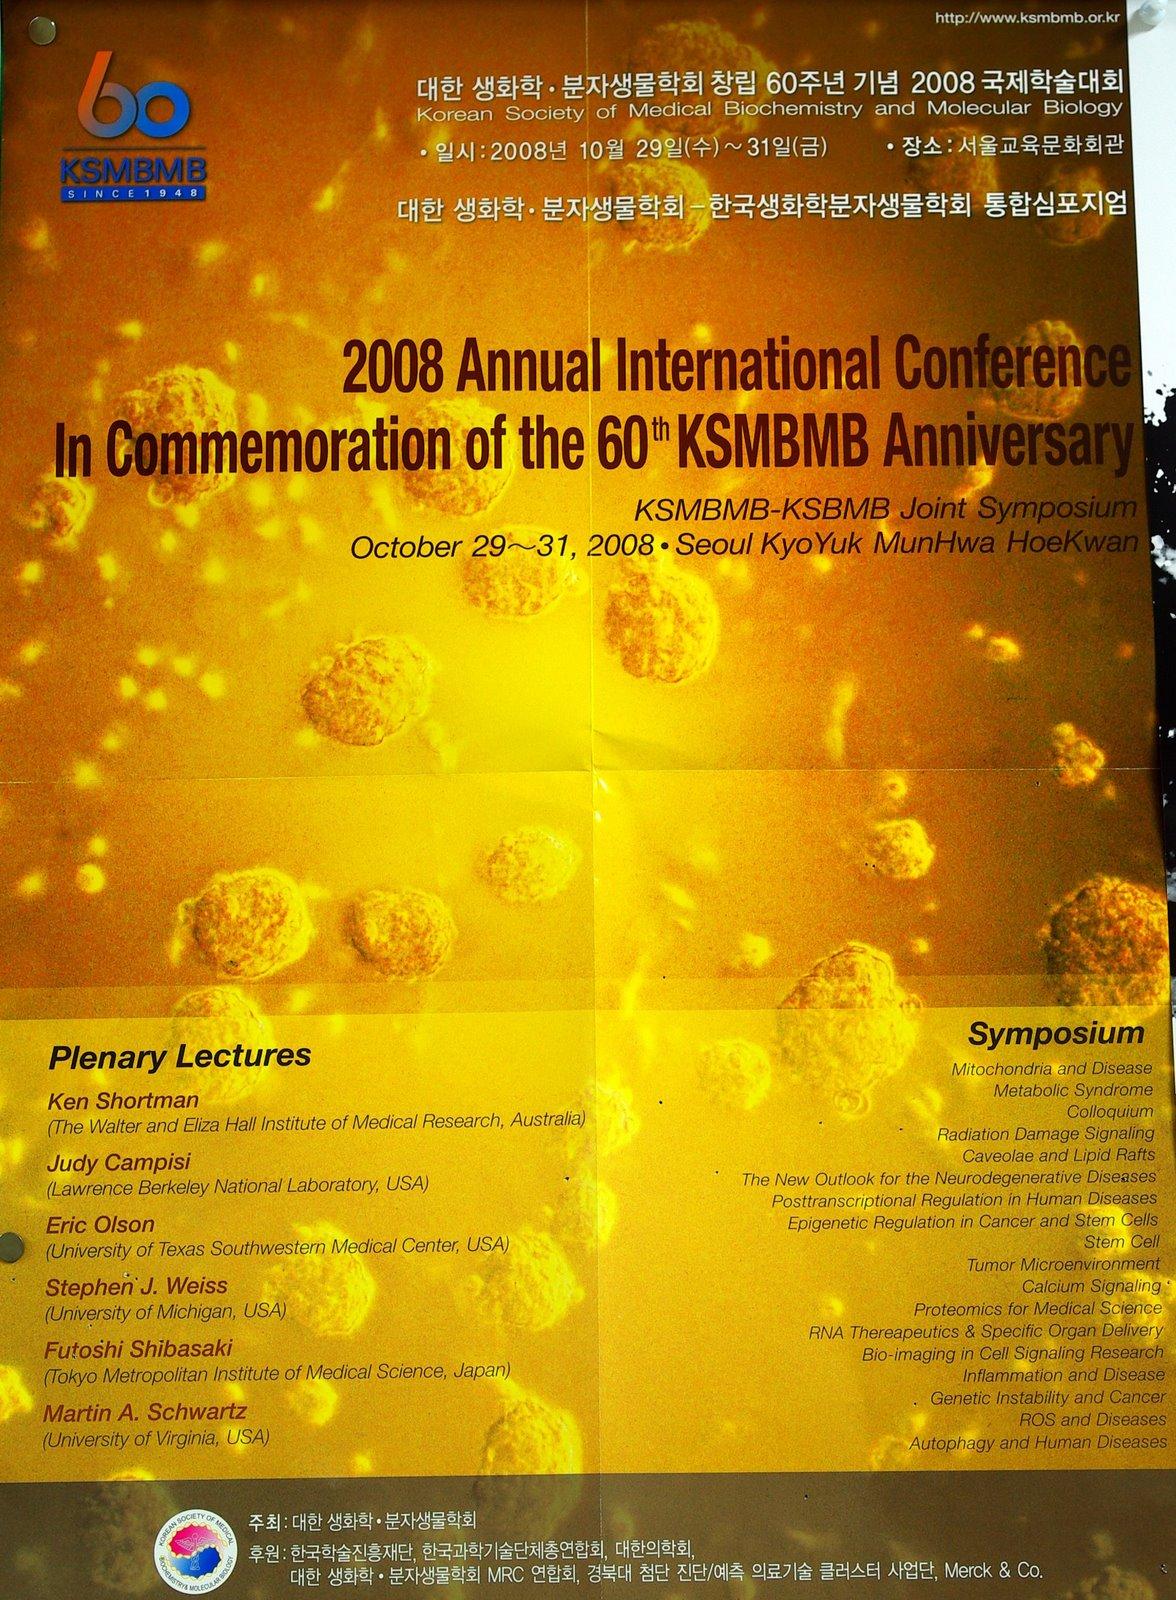 [ksmbmb-ksbmb+symposium.jpg]